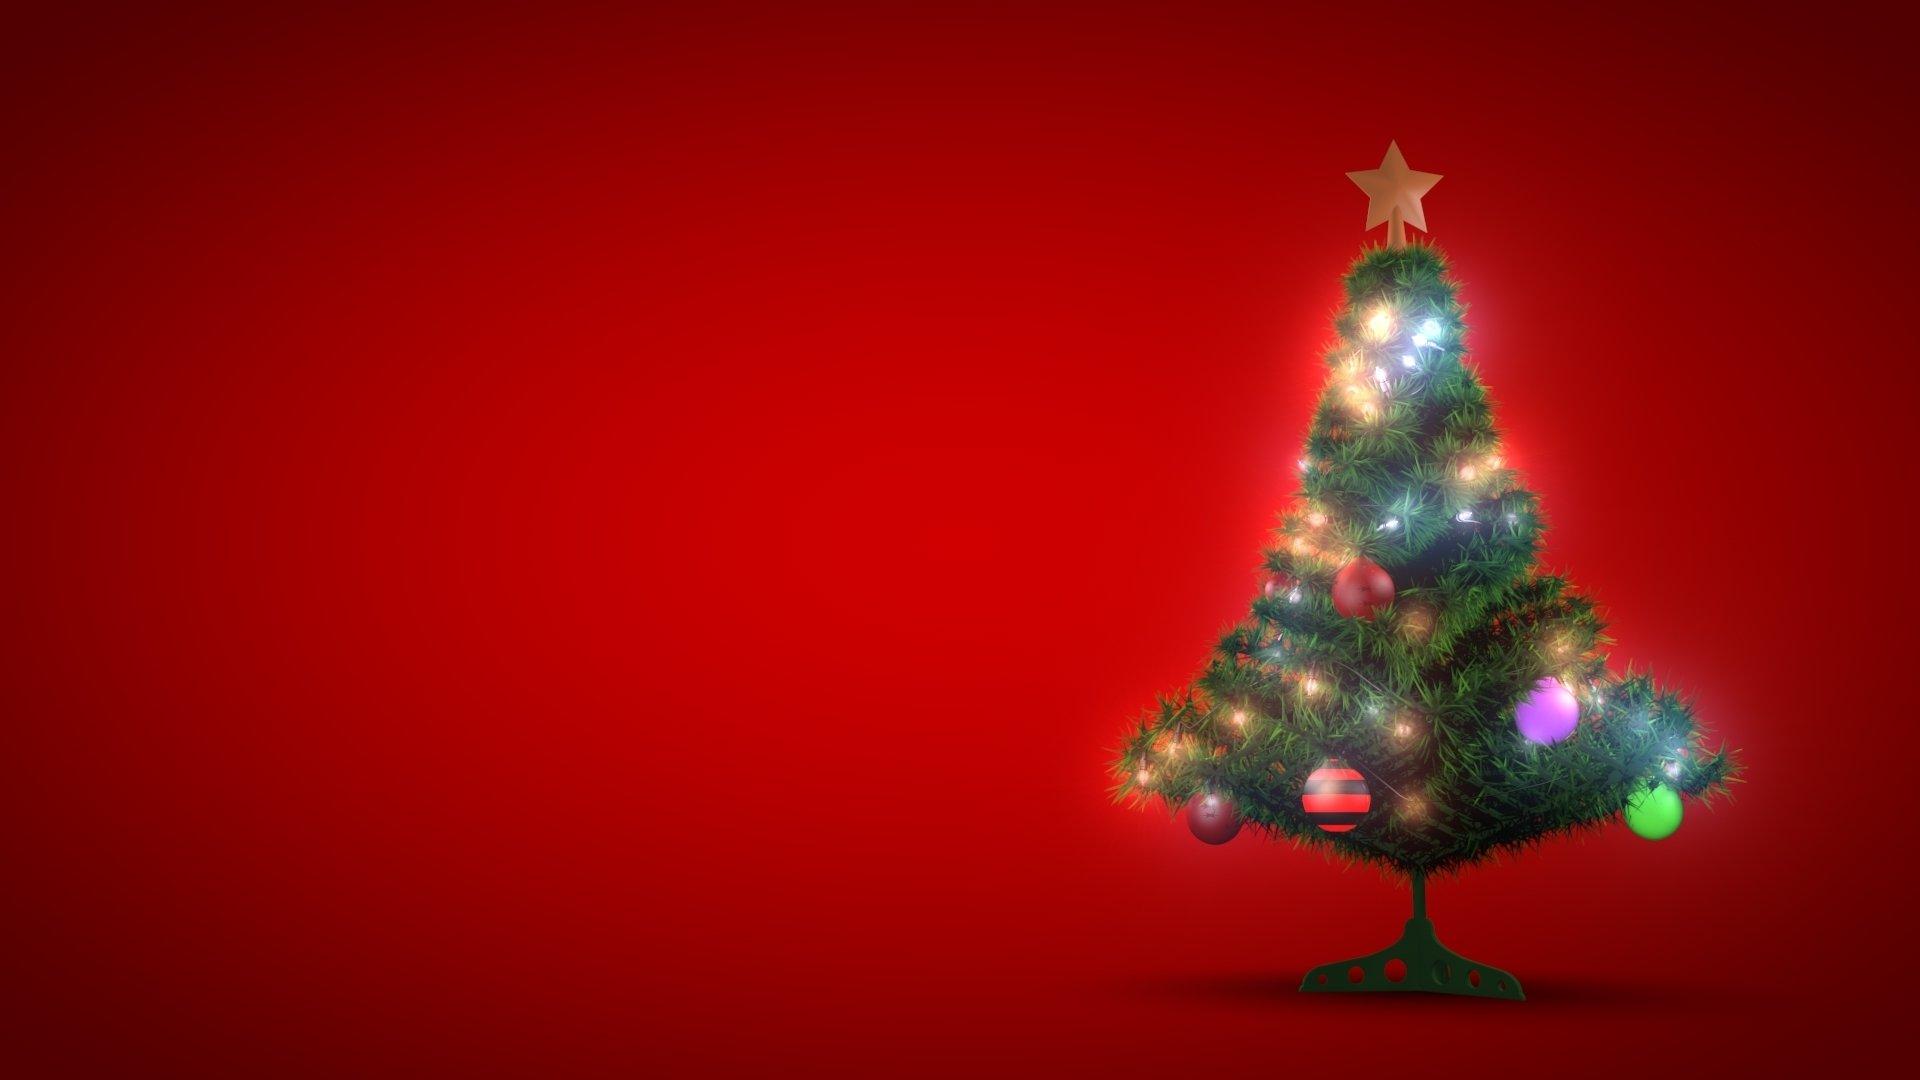 Christmas tree wallpapers 1920x1080 full hd 1080p - Hd christmas wallpapers 1080p ...